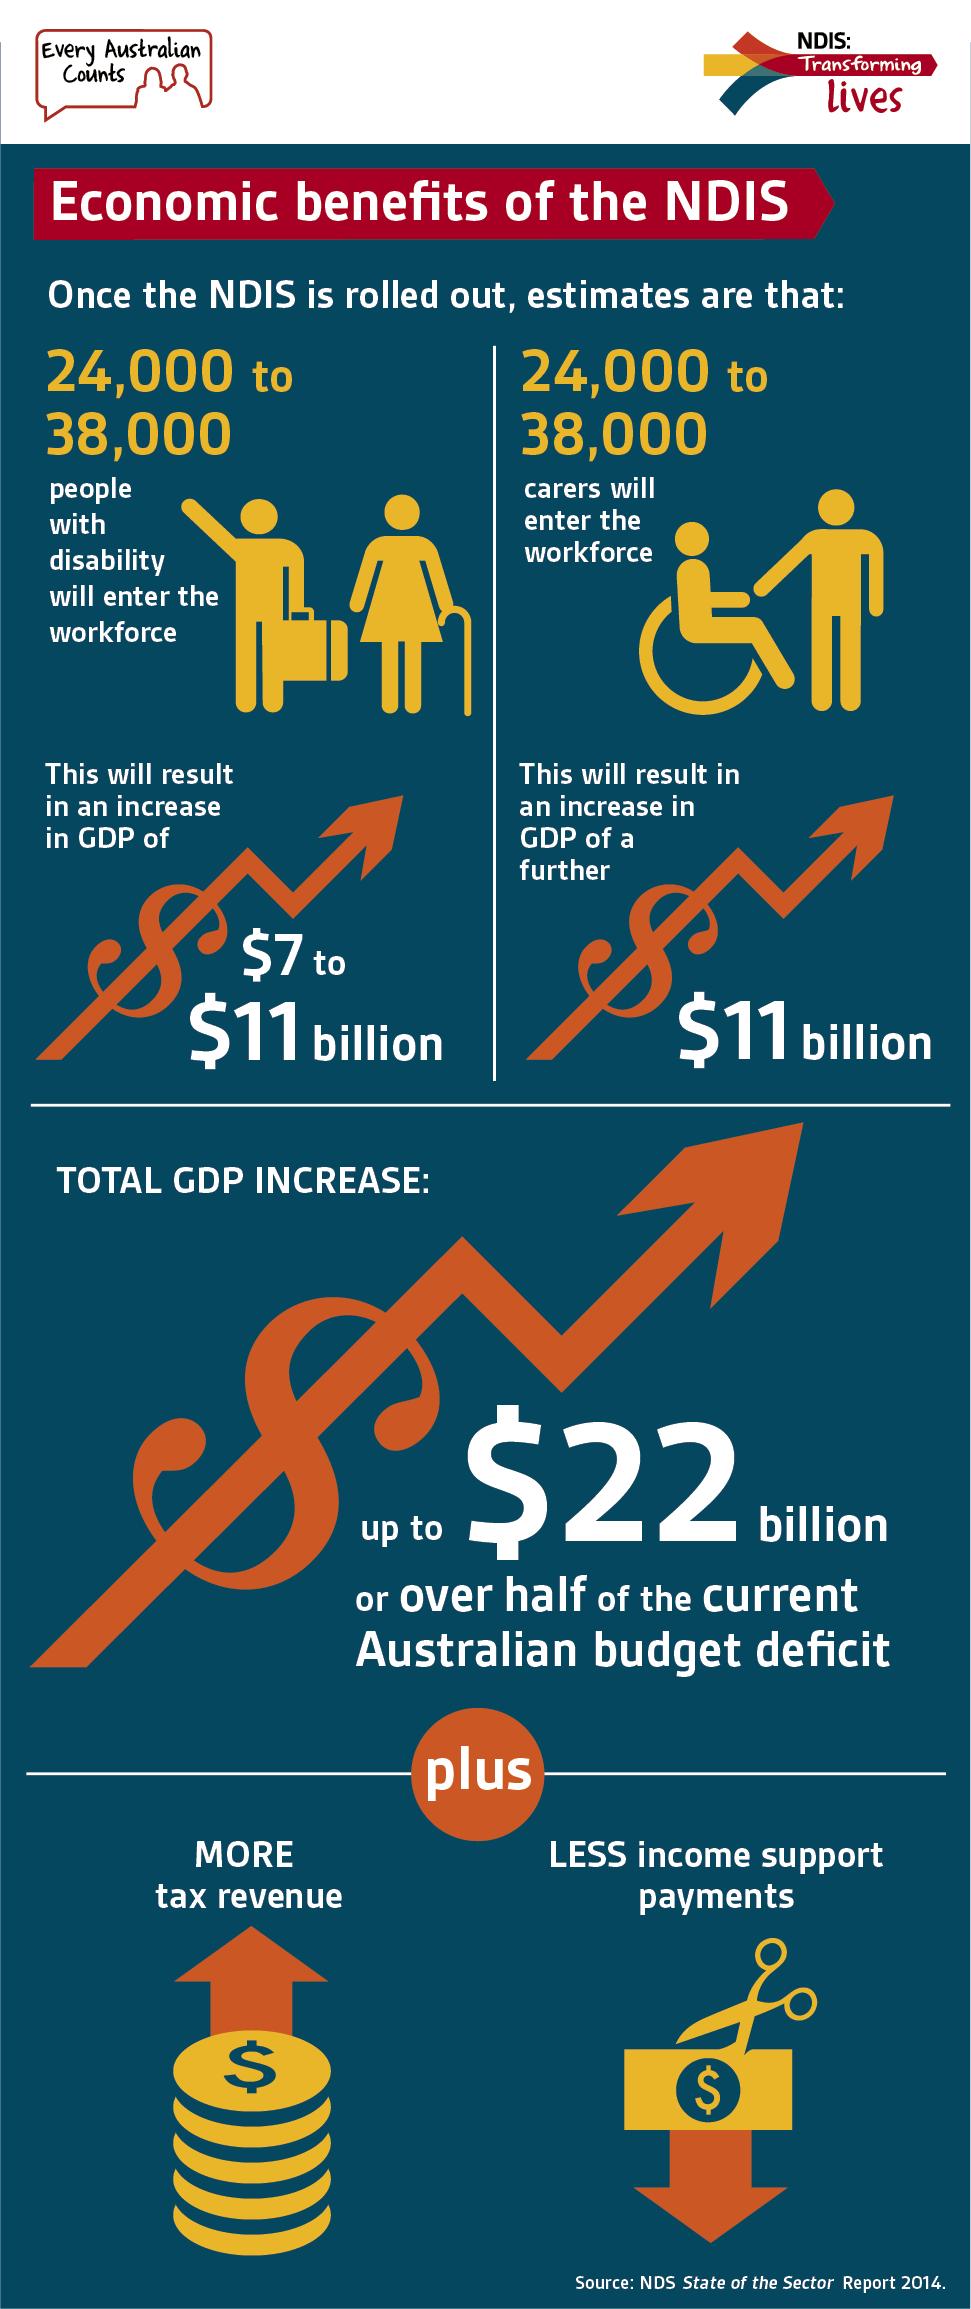 Economic benefits of the NDIS